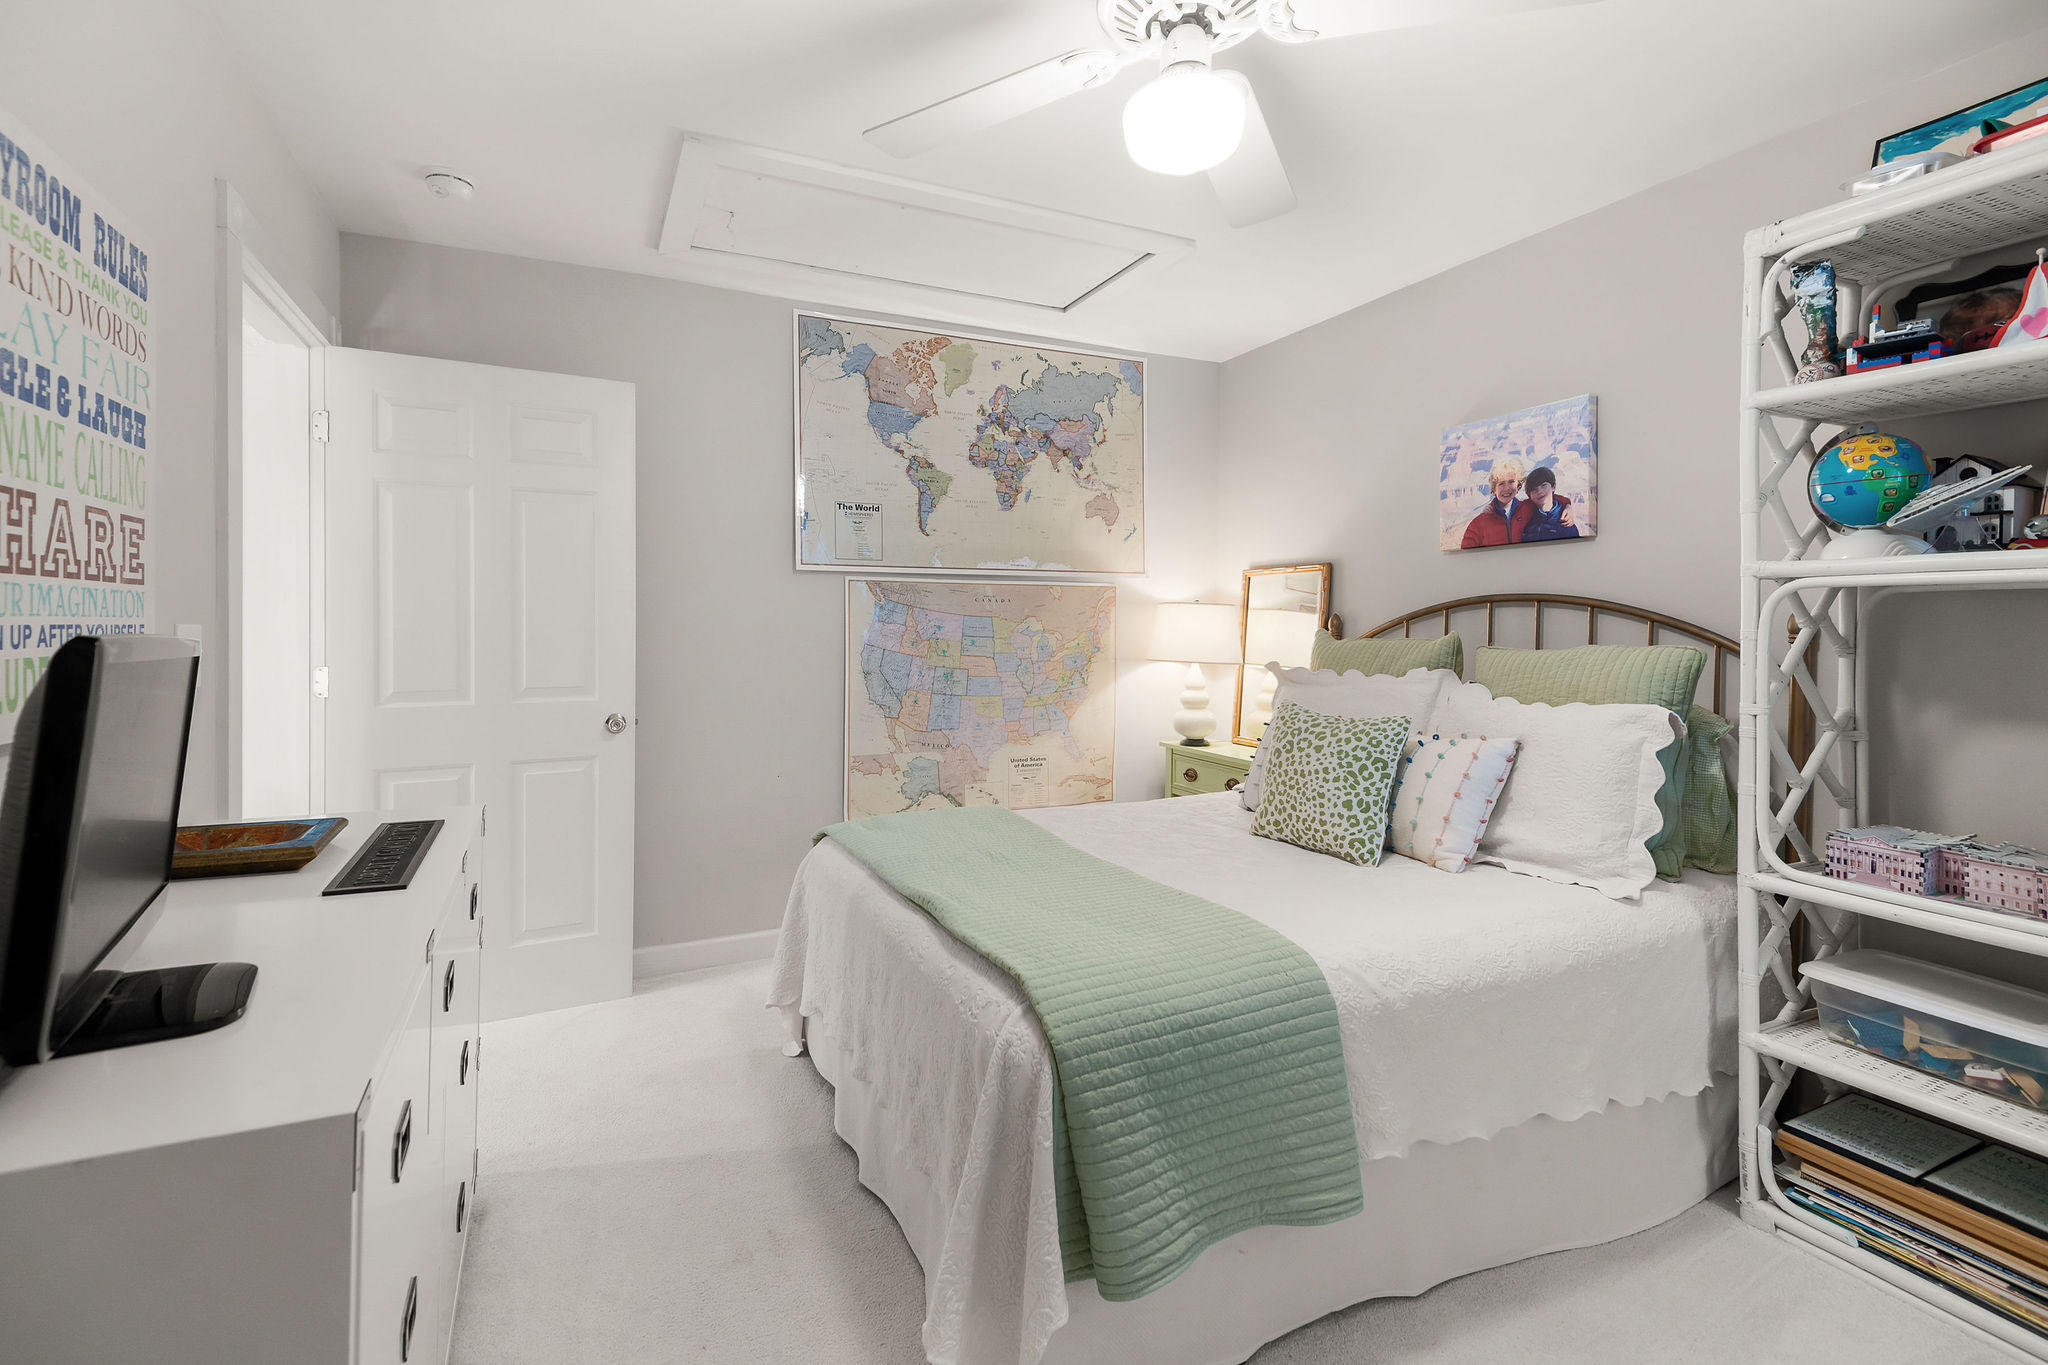 Country Club II Homes For Sale - 1482 Burningtree, Charleston, SC - 23